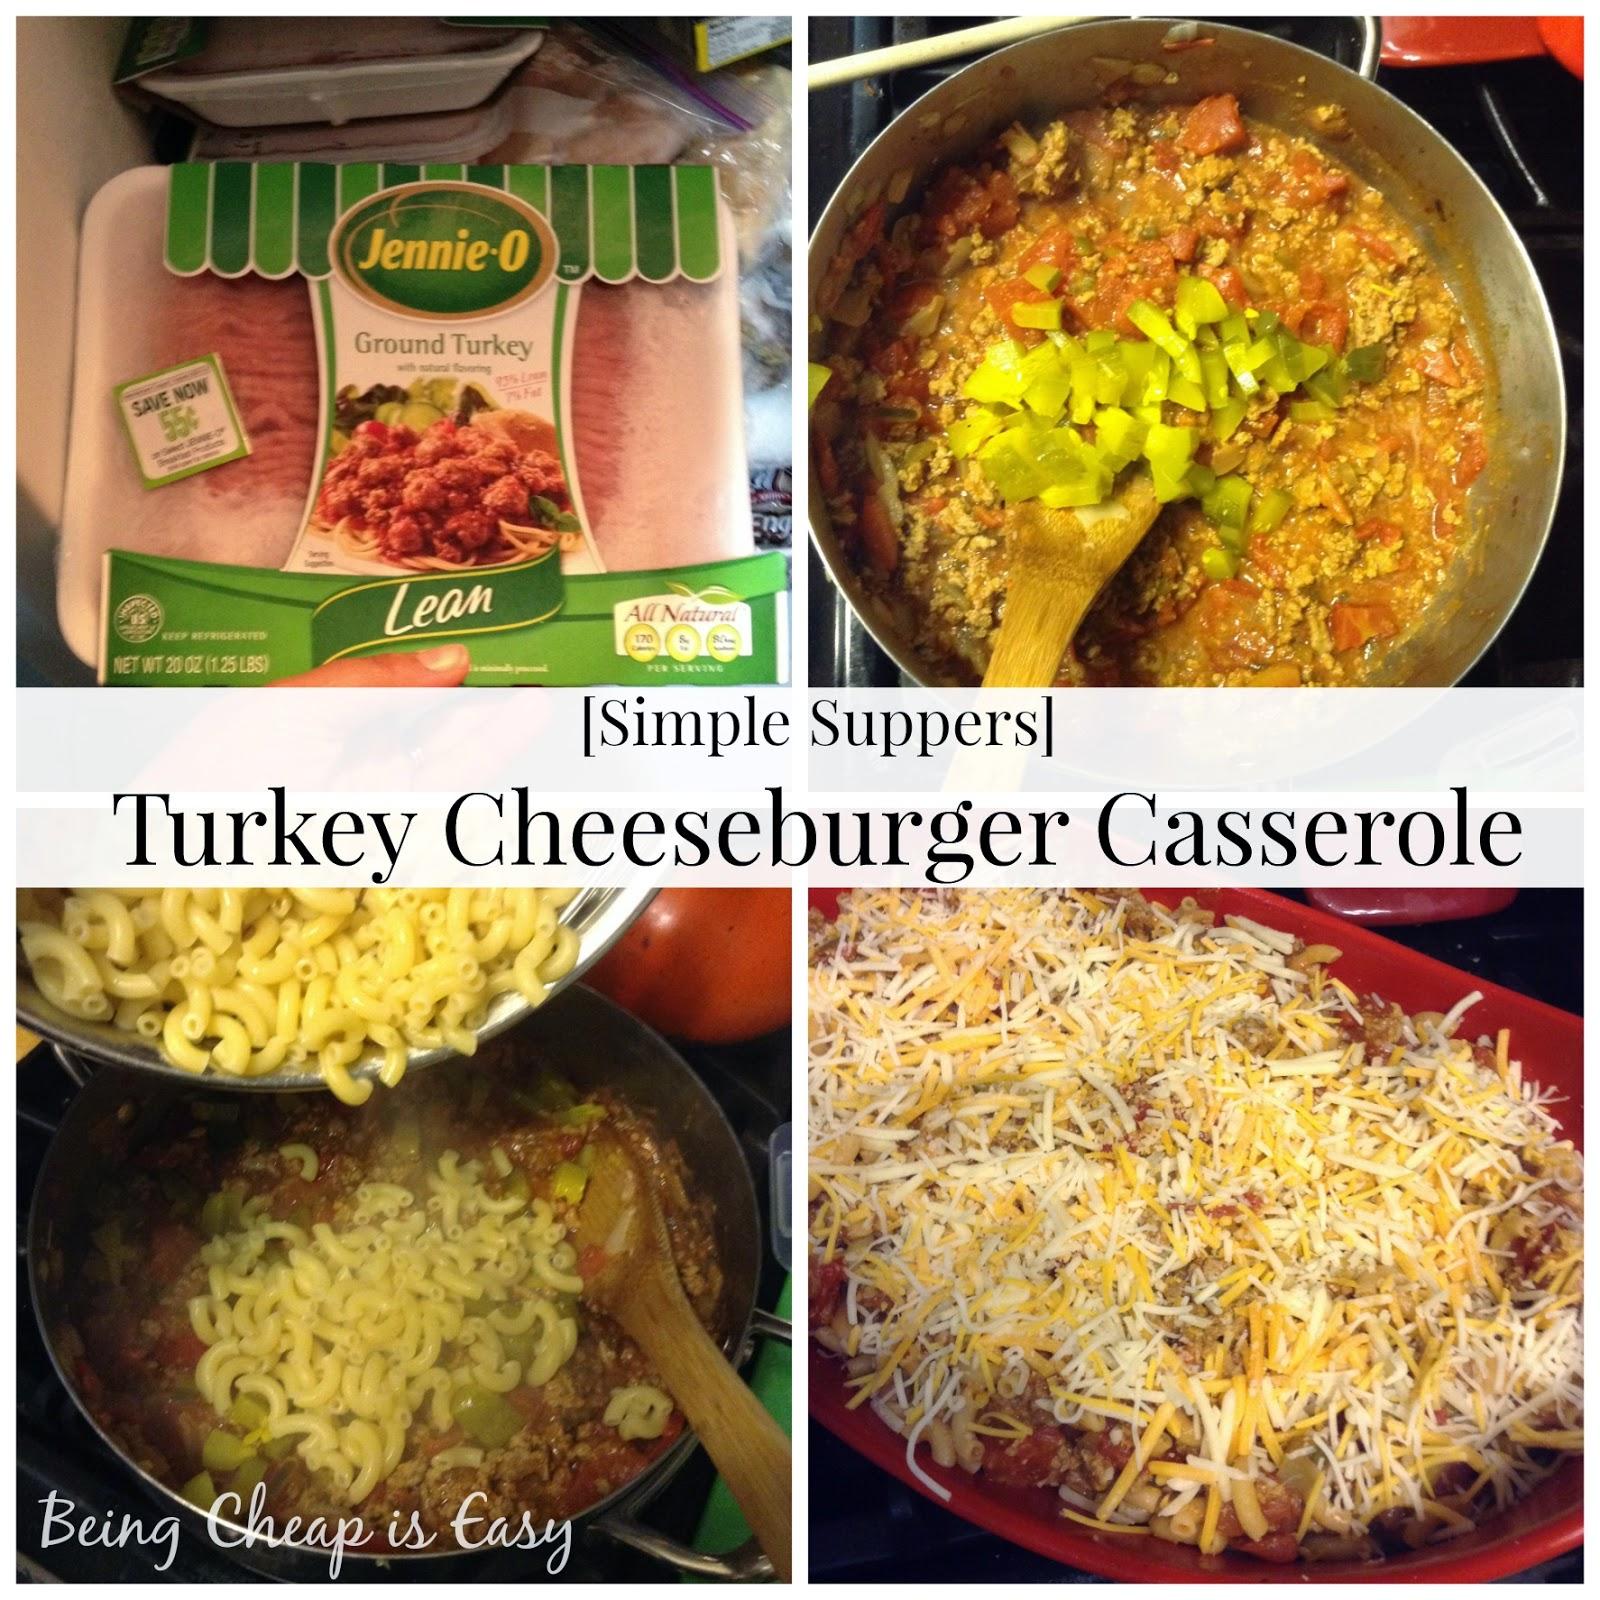 Cheeseburger, Simple Dinners, Casseroles, Ground Turkey, Jennie-O